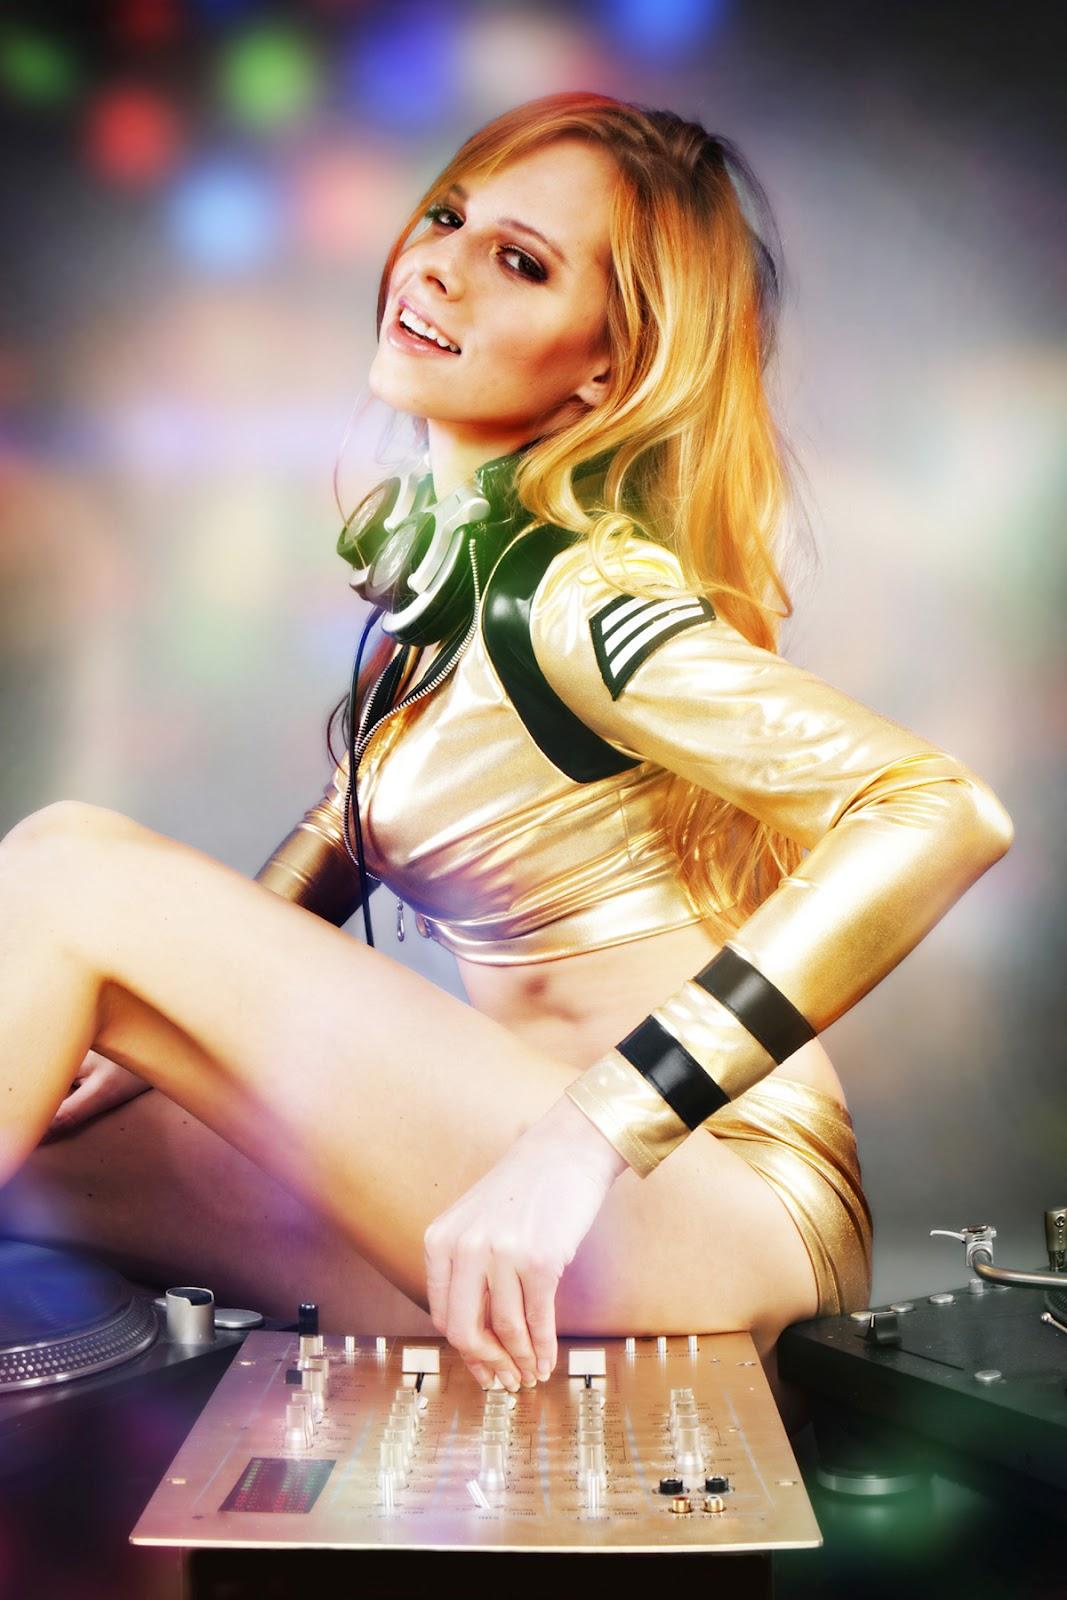 http://1.bp.blogspot.com/-44dSZ6VbyGk/Ty7HyBPOlaI/AAAAAAAADIg/JmX34GSRi98/s1600/Beauty+American+Woman+DJ+%283%29.jpg